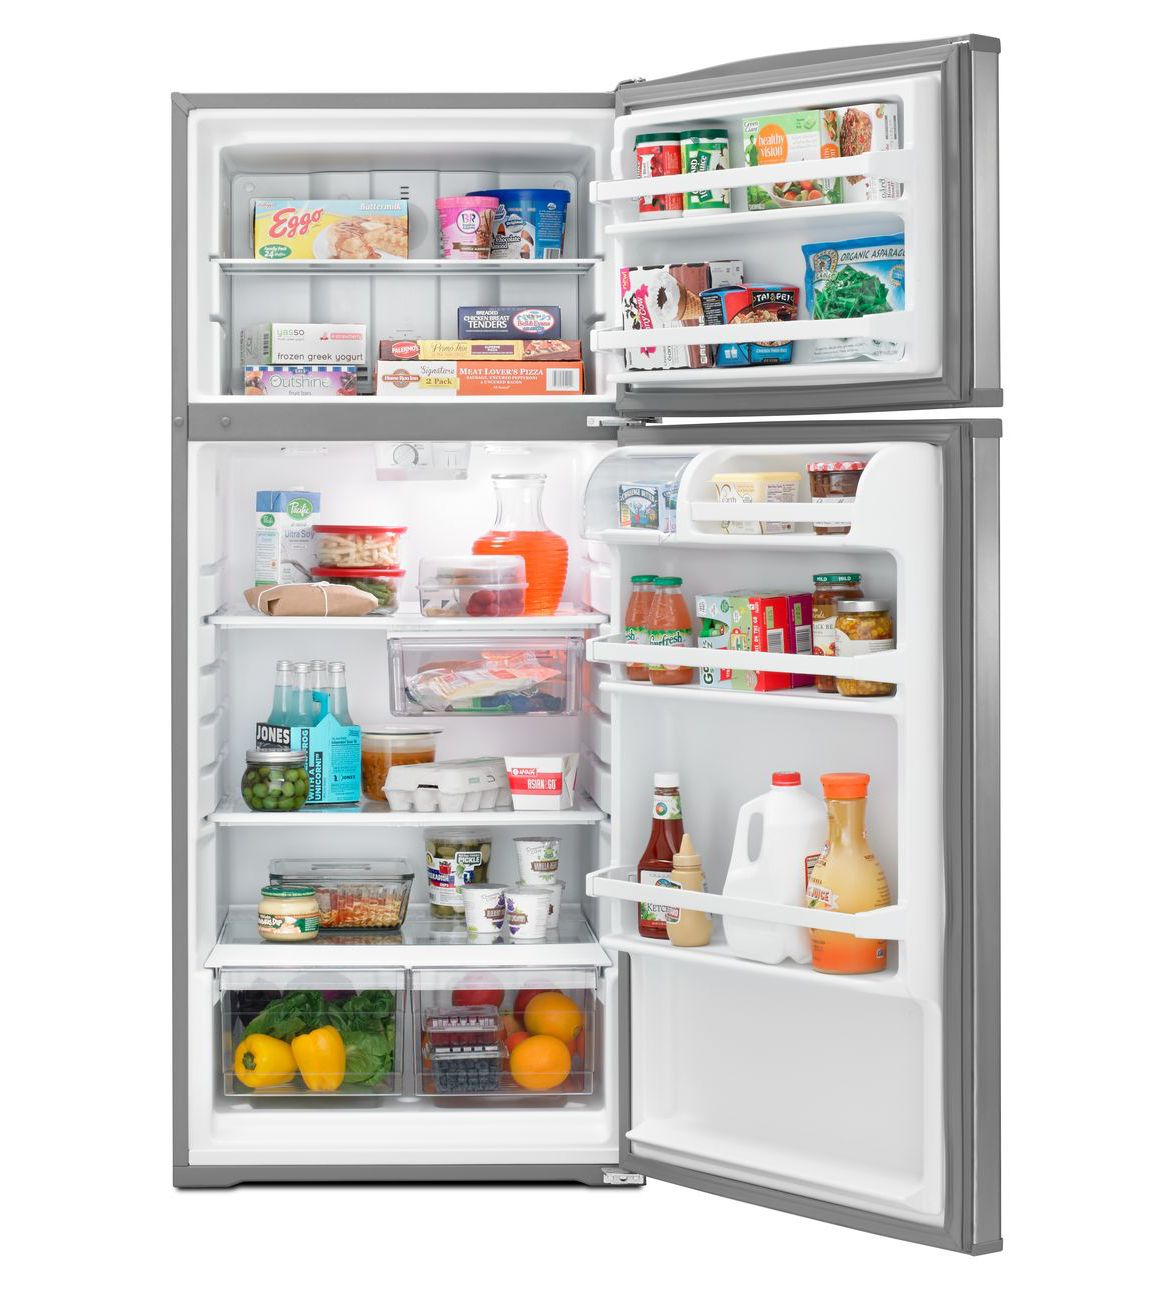 Whirlpool 28 Inch Wide Top Freezer Refrigerator Master